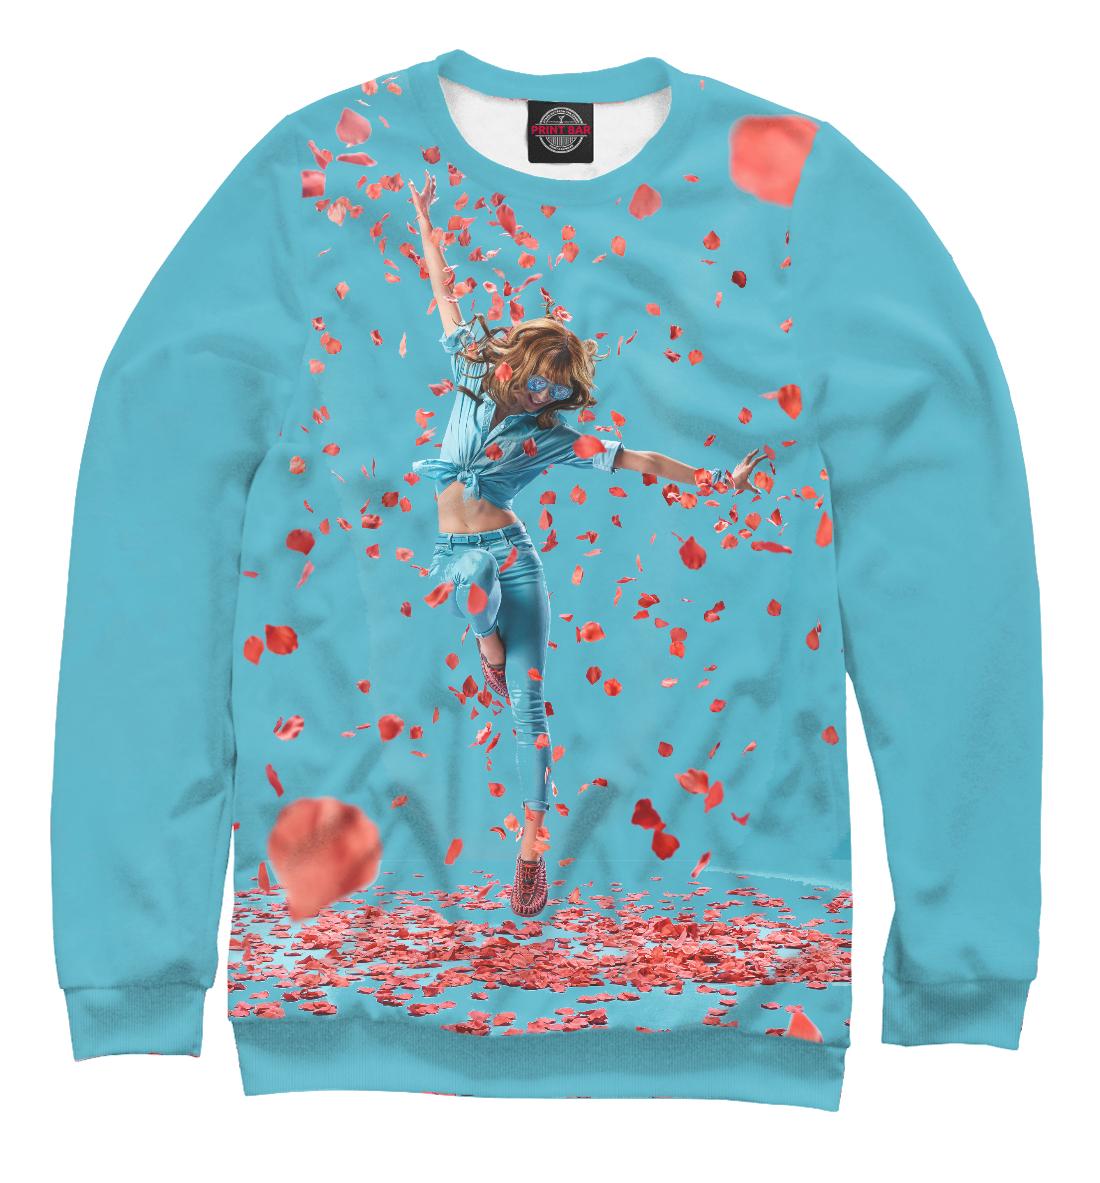 Купить Танец радости, Printbar, Свитшоты, APD-886835-swi-2